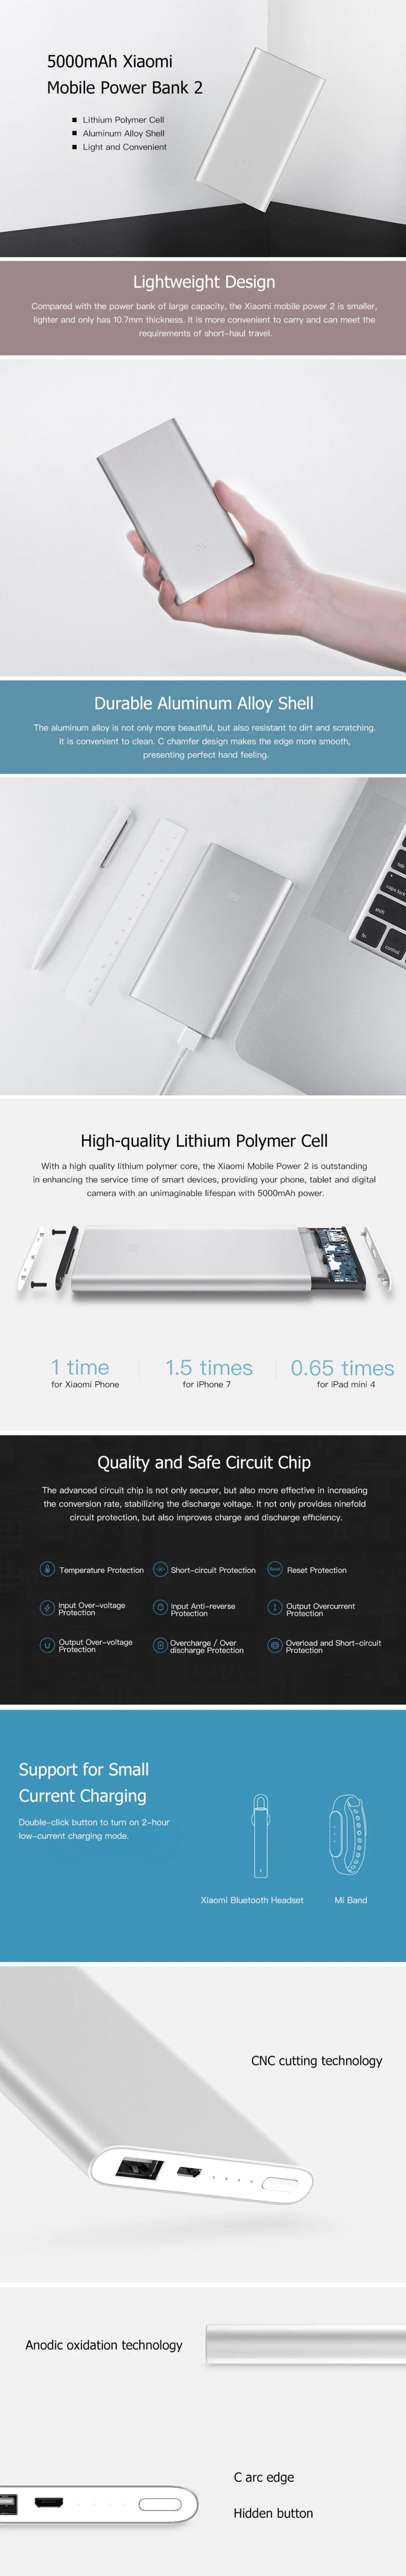 Prezentare-Xiaomi-Mi-Power-Bank-26b1e7eb97b513ab0.jpg